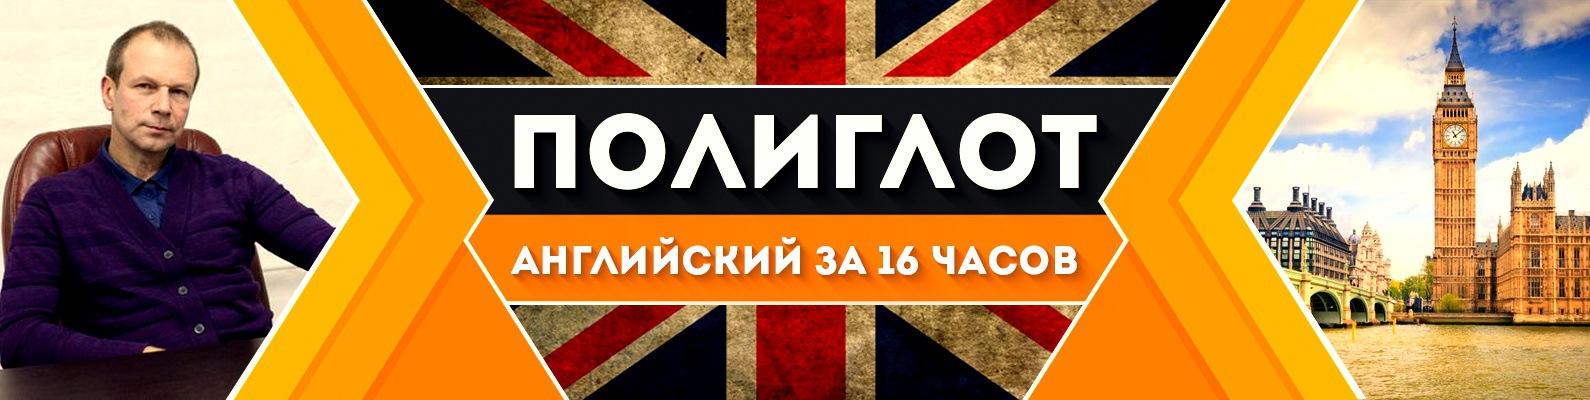 Mir yrokov.английский язык биболетова11класс